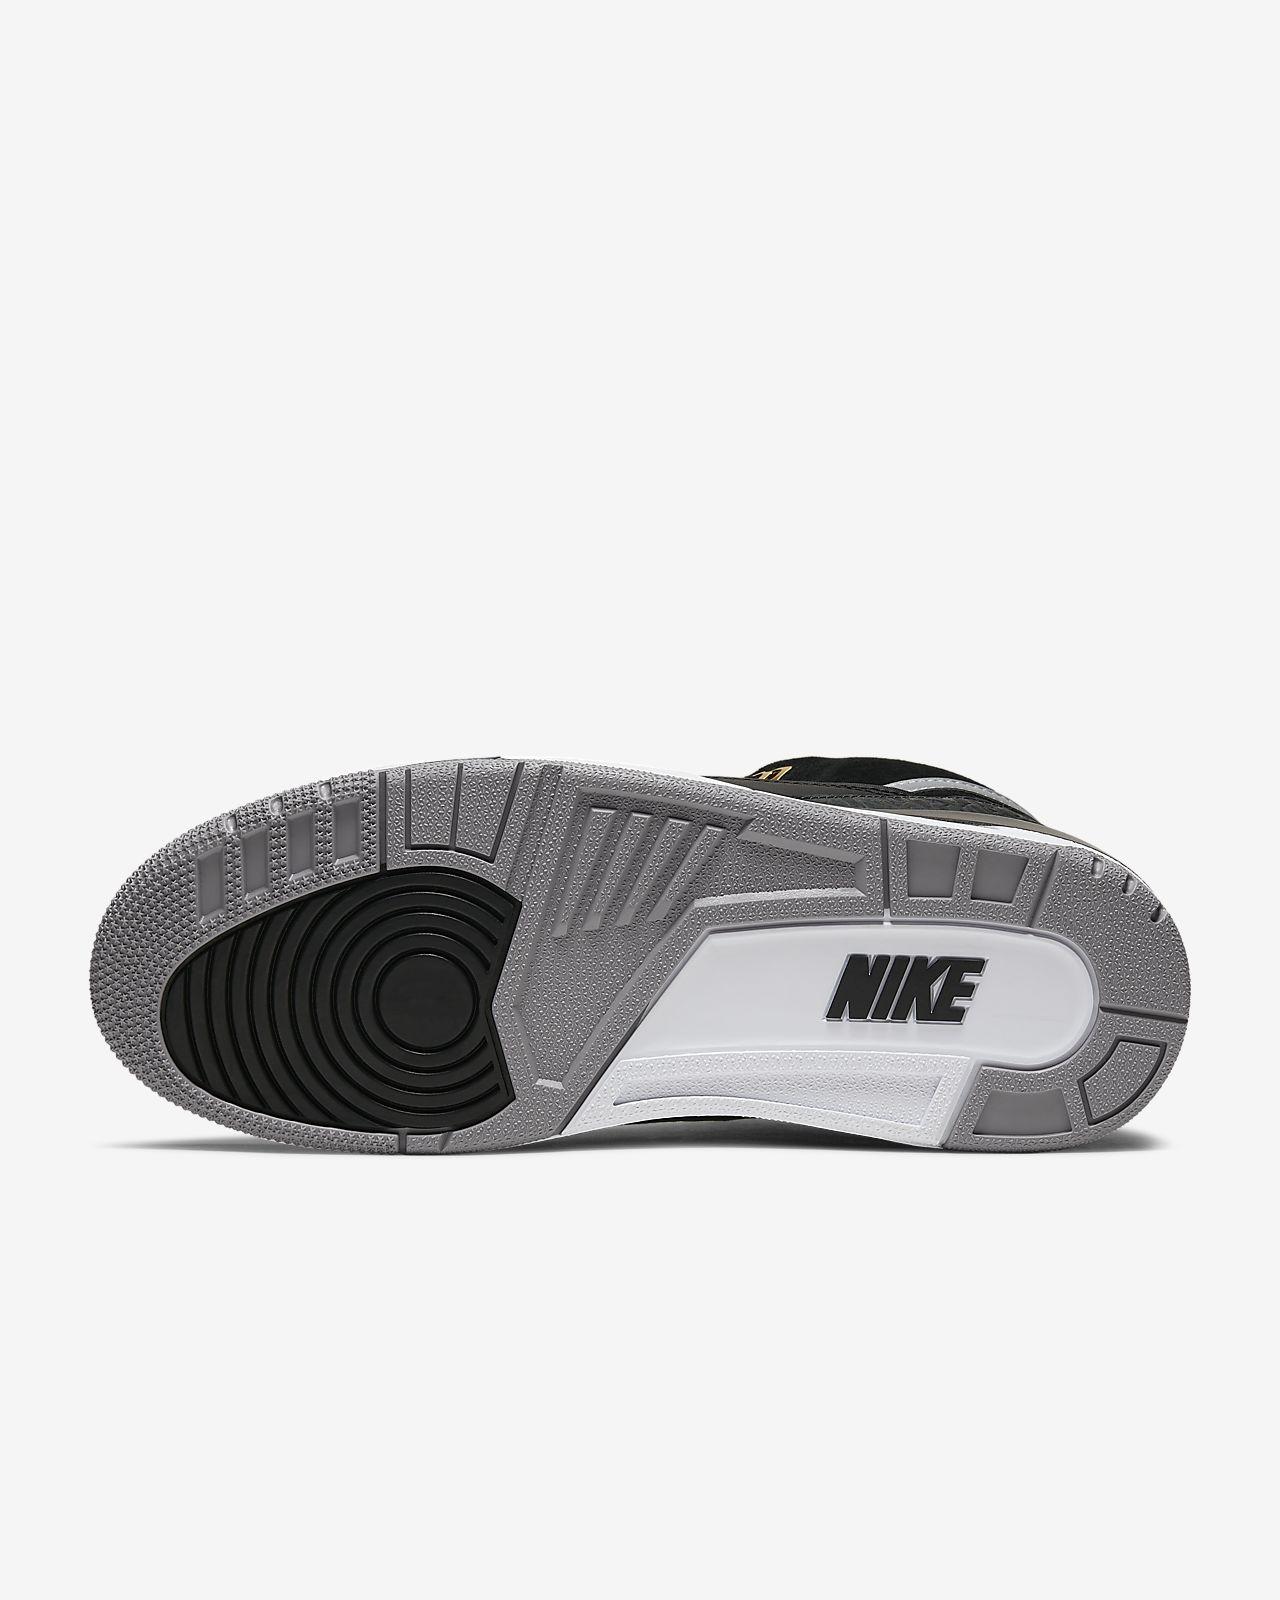 air jordan bianche, Trainer e scarpe Nike Free OG 14 Retro